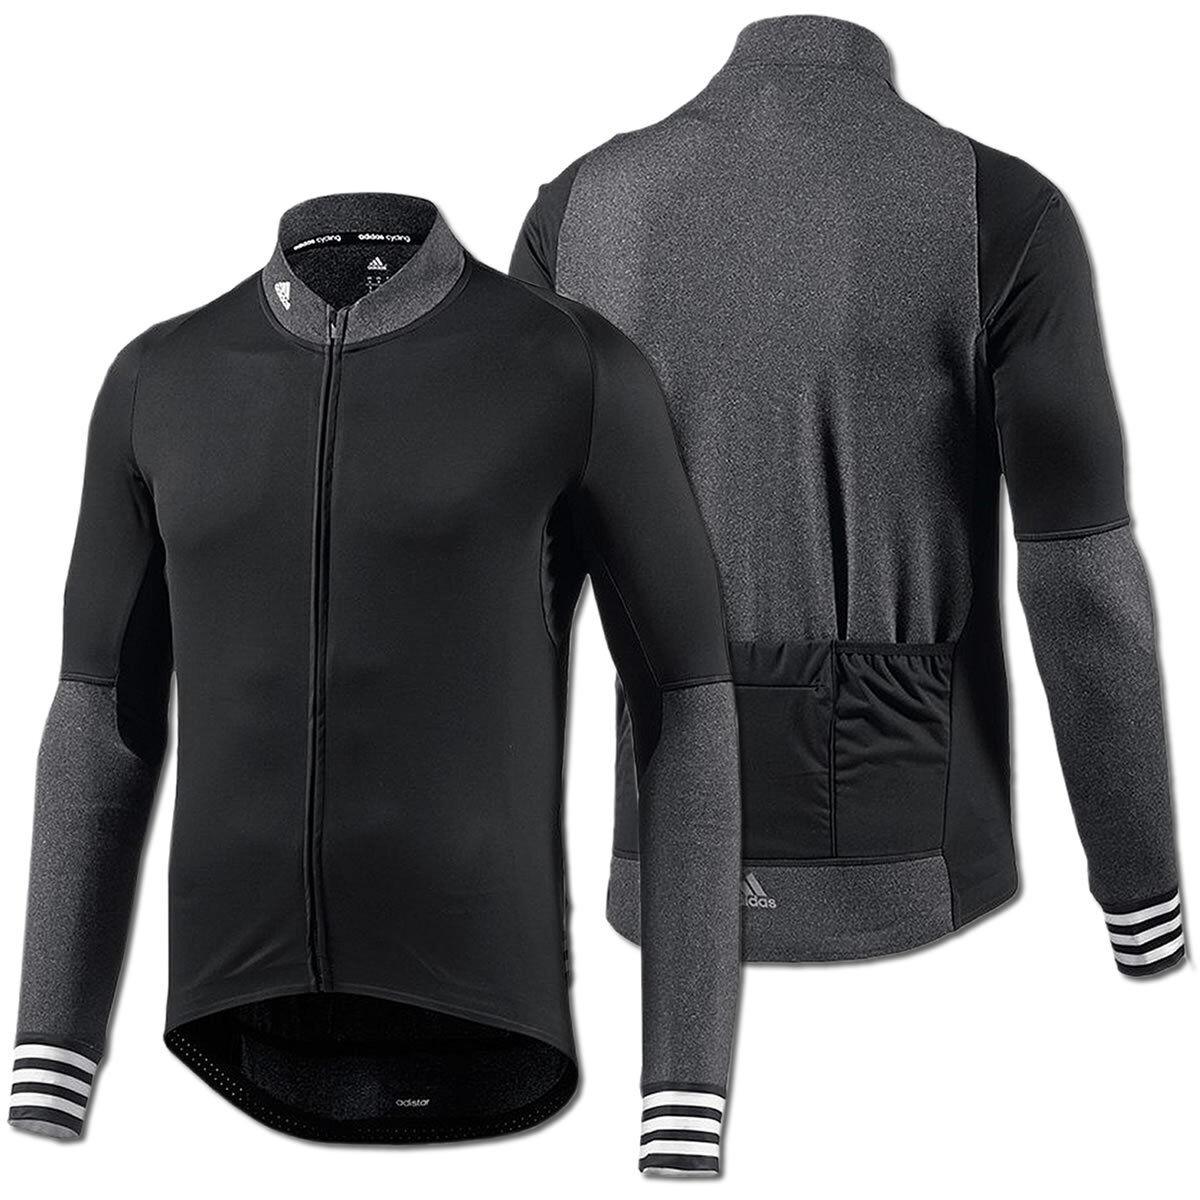 Adidas Herren adistar Belgements Radtrikot Cycling Jersey Bike Trikot schwarz